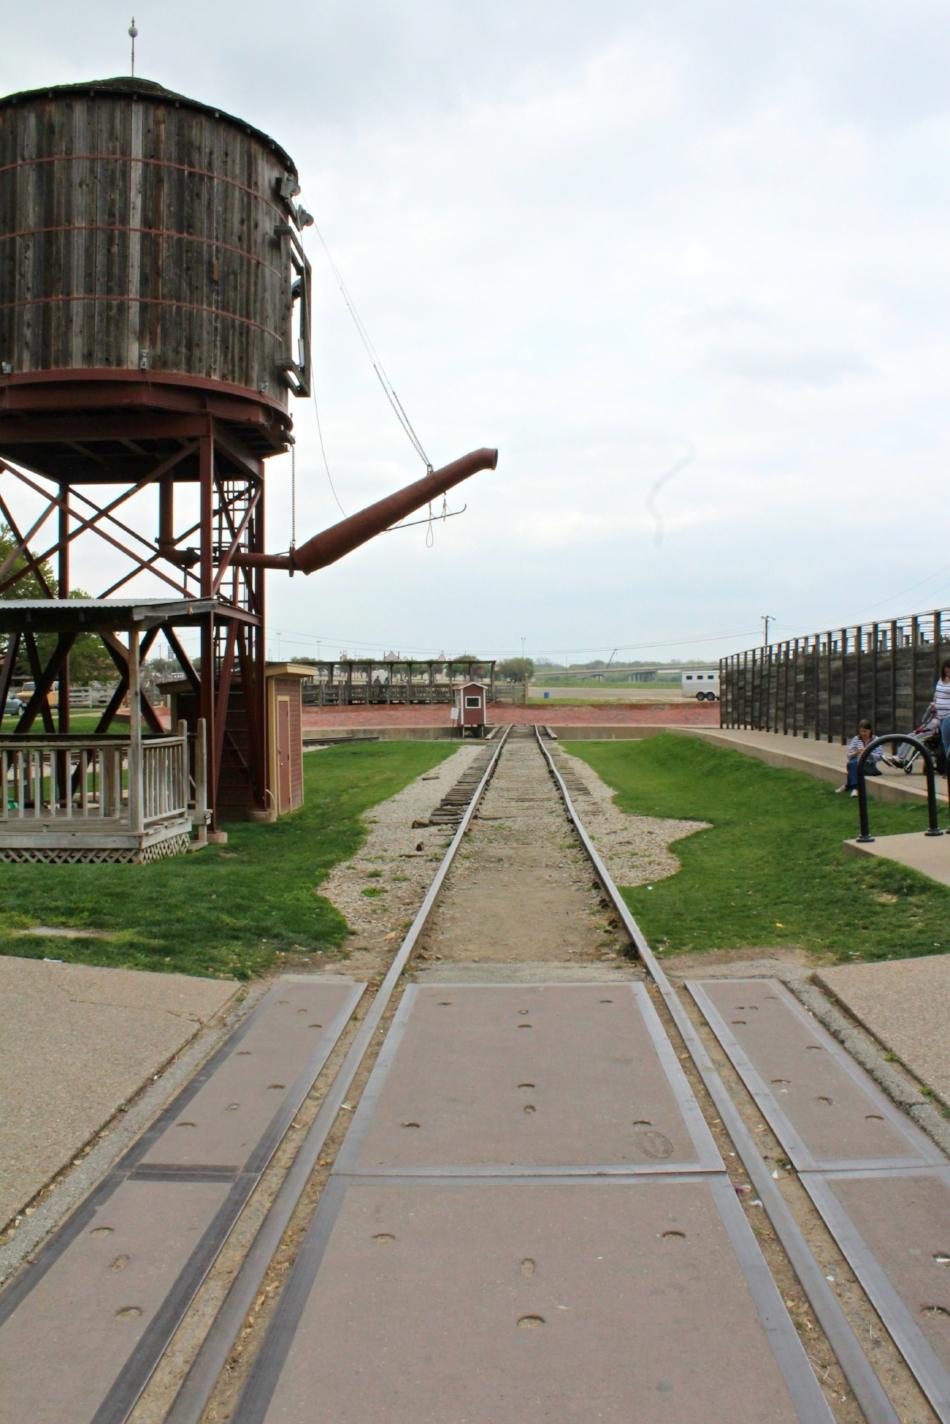 Fort Worth Stockyards 3.0.jpg